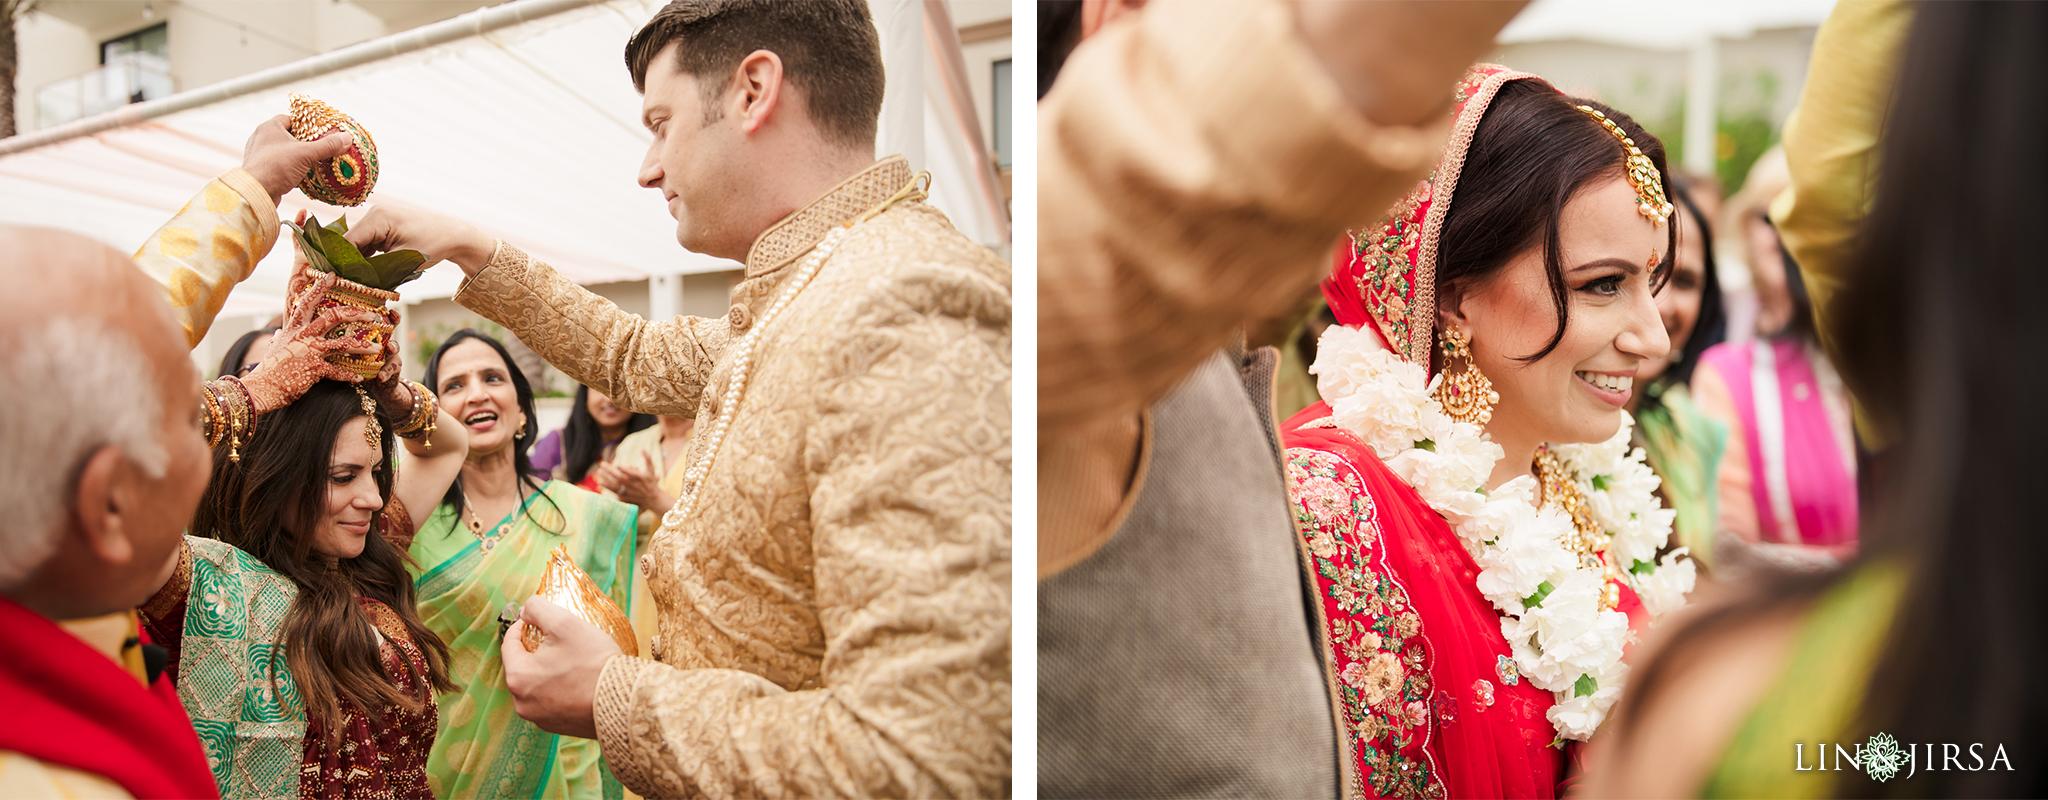 14 The Waterfront Beach Resort Orange County Indian Wedding Photography